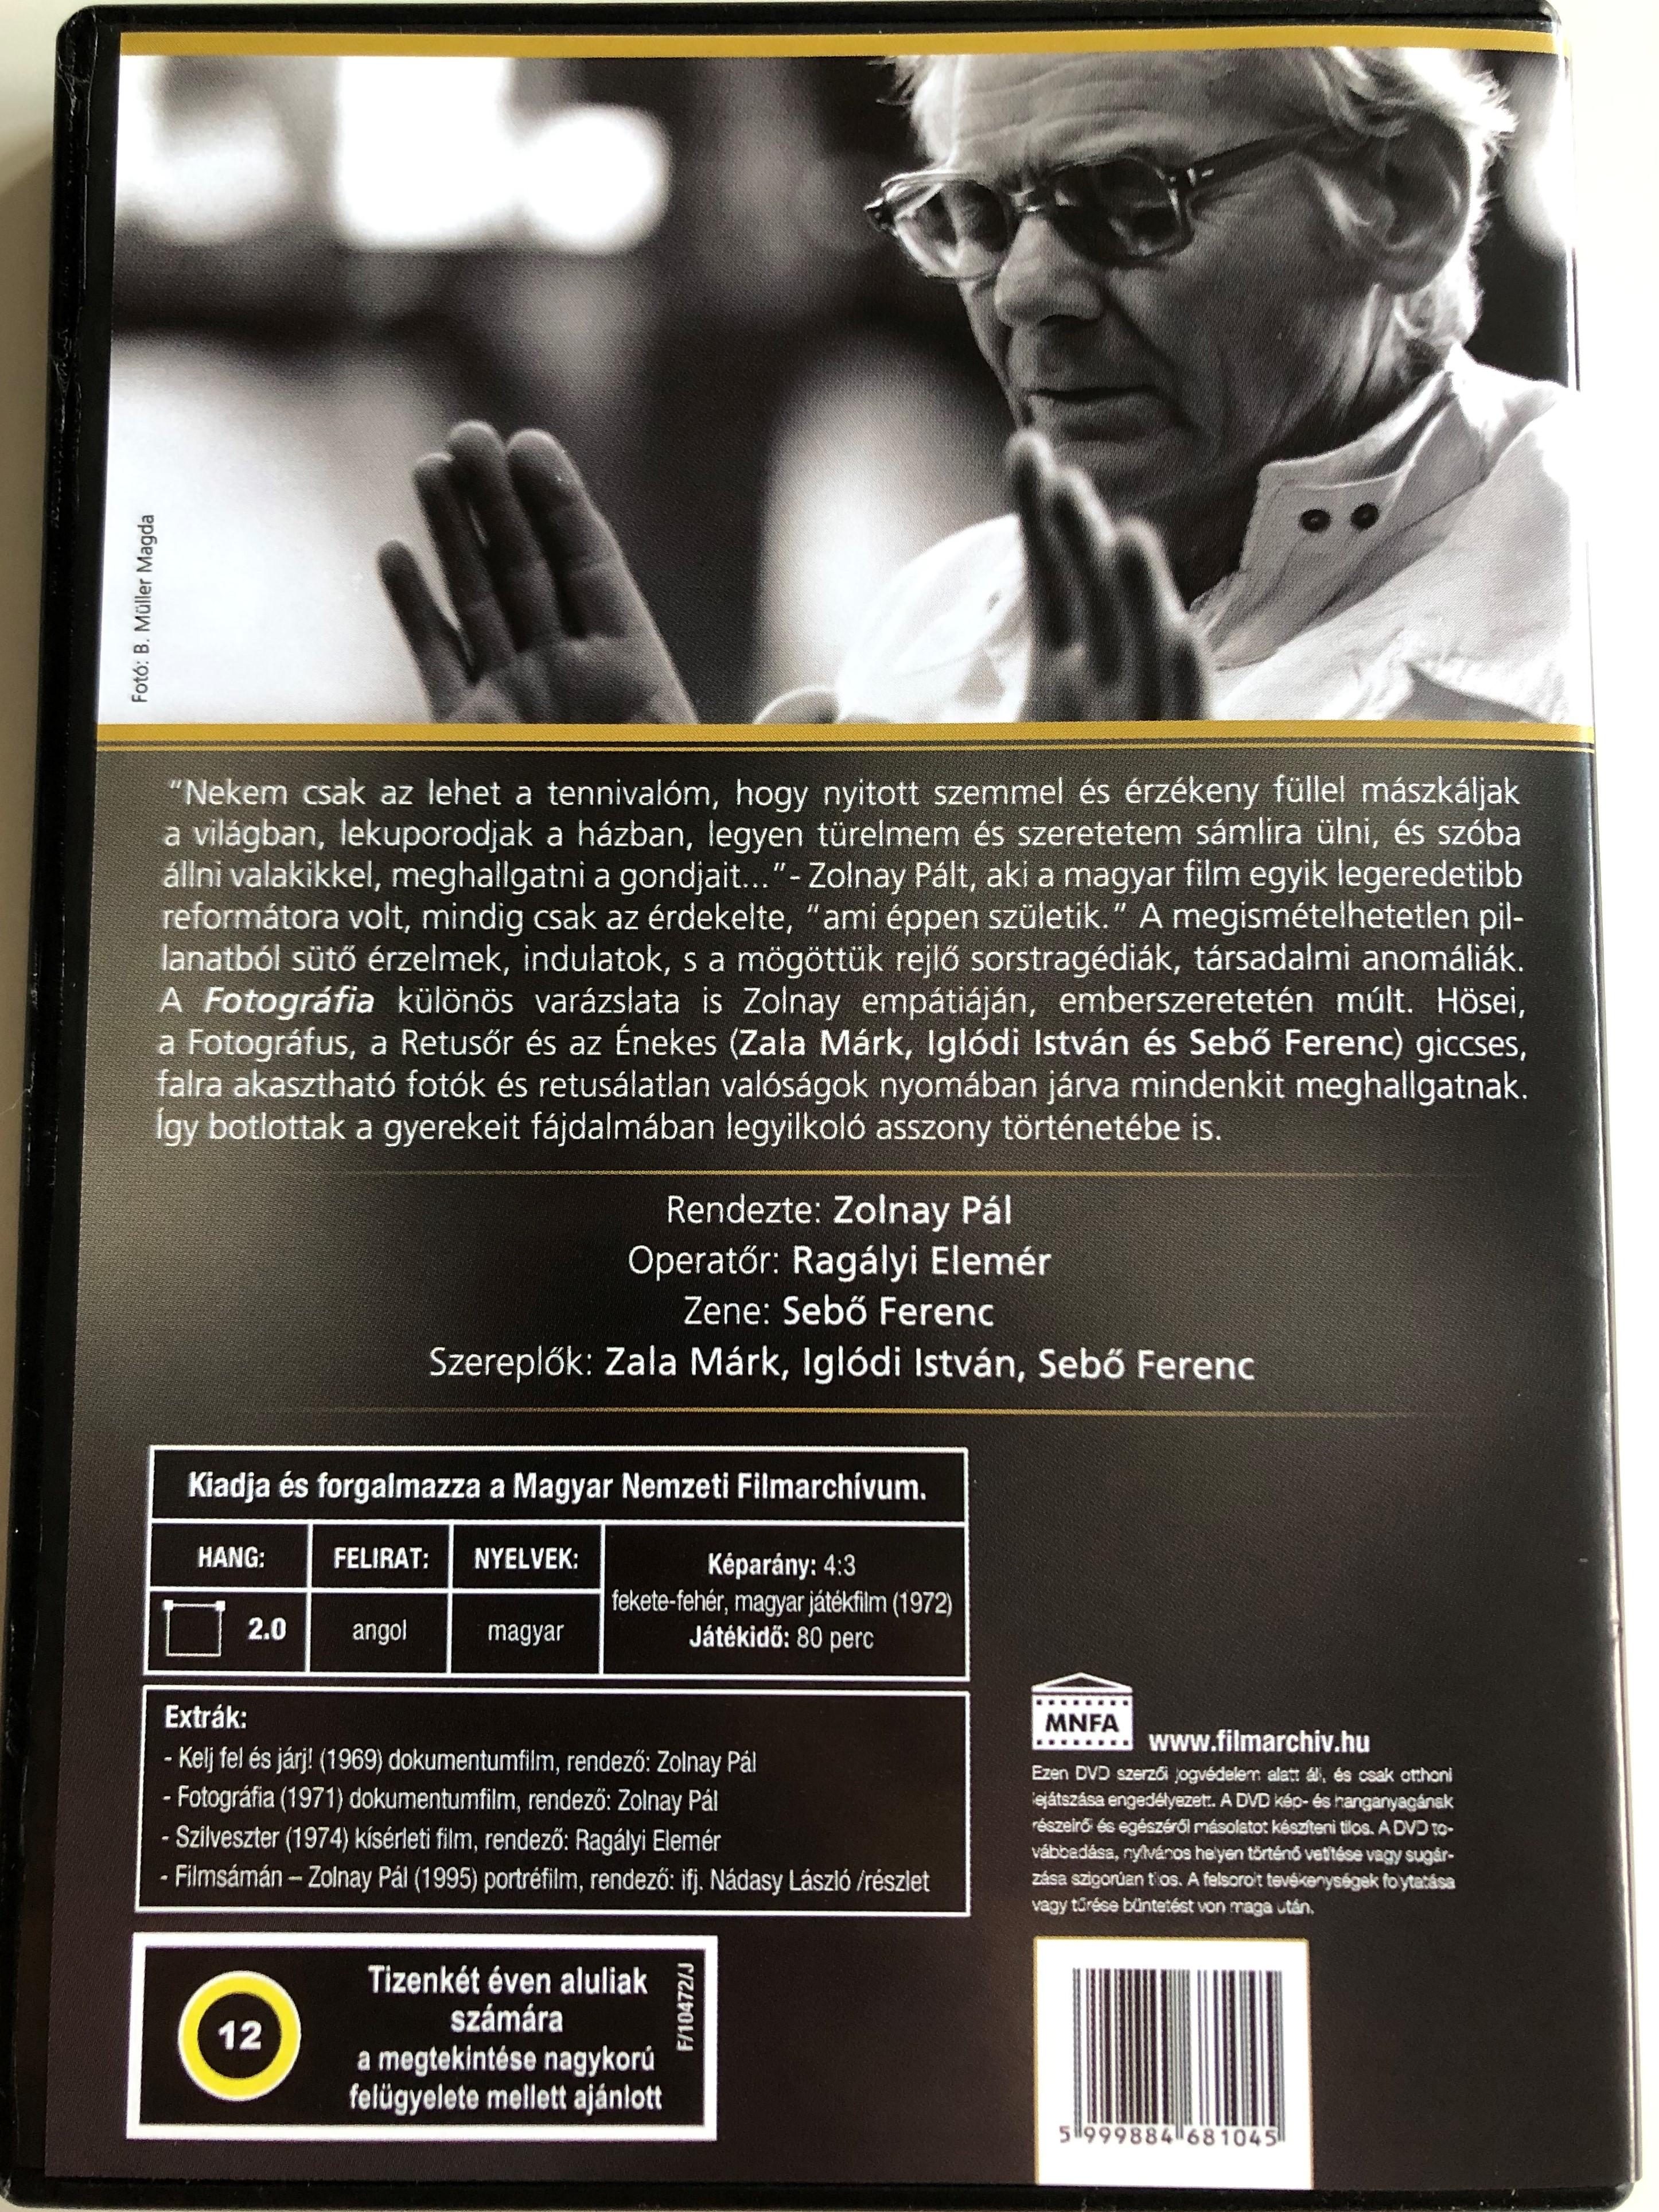 fotogr-fia-magyar-film-dvd-hungarian-cinema-directed-by-p-l-zolnay-starring-zala-m-rk-igl-di-istv-n-seb-ferenc-magyar-nemzeti-filmarch-vum-magyar-filmt-rt-neti-sorozat-2-.jpg